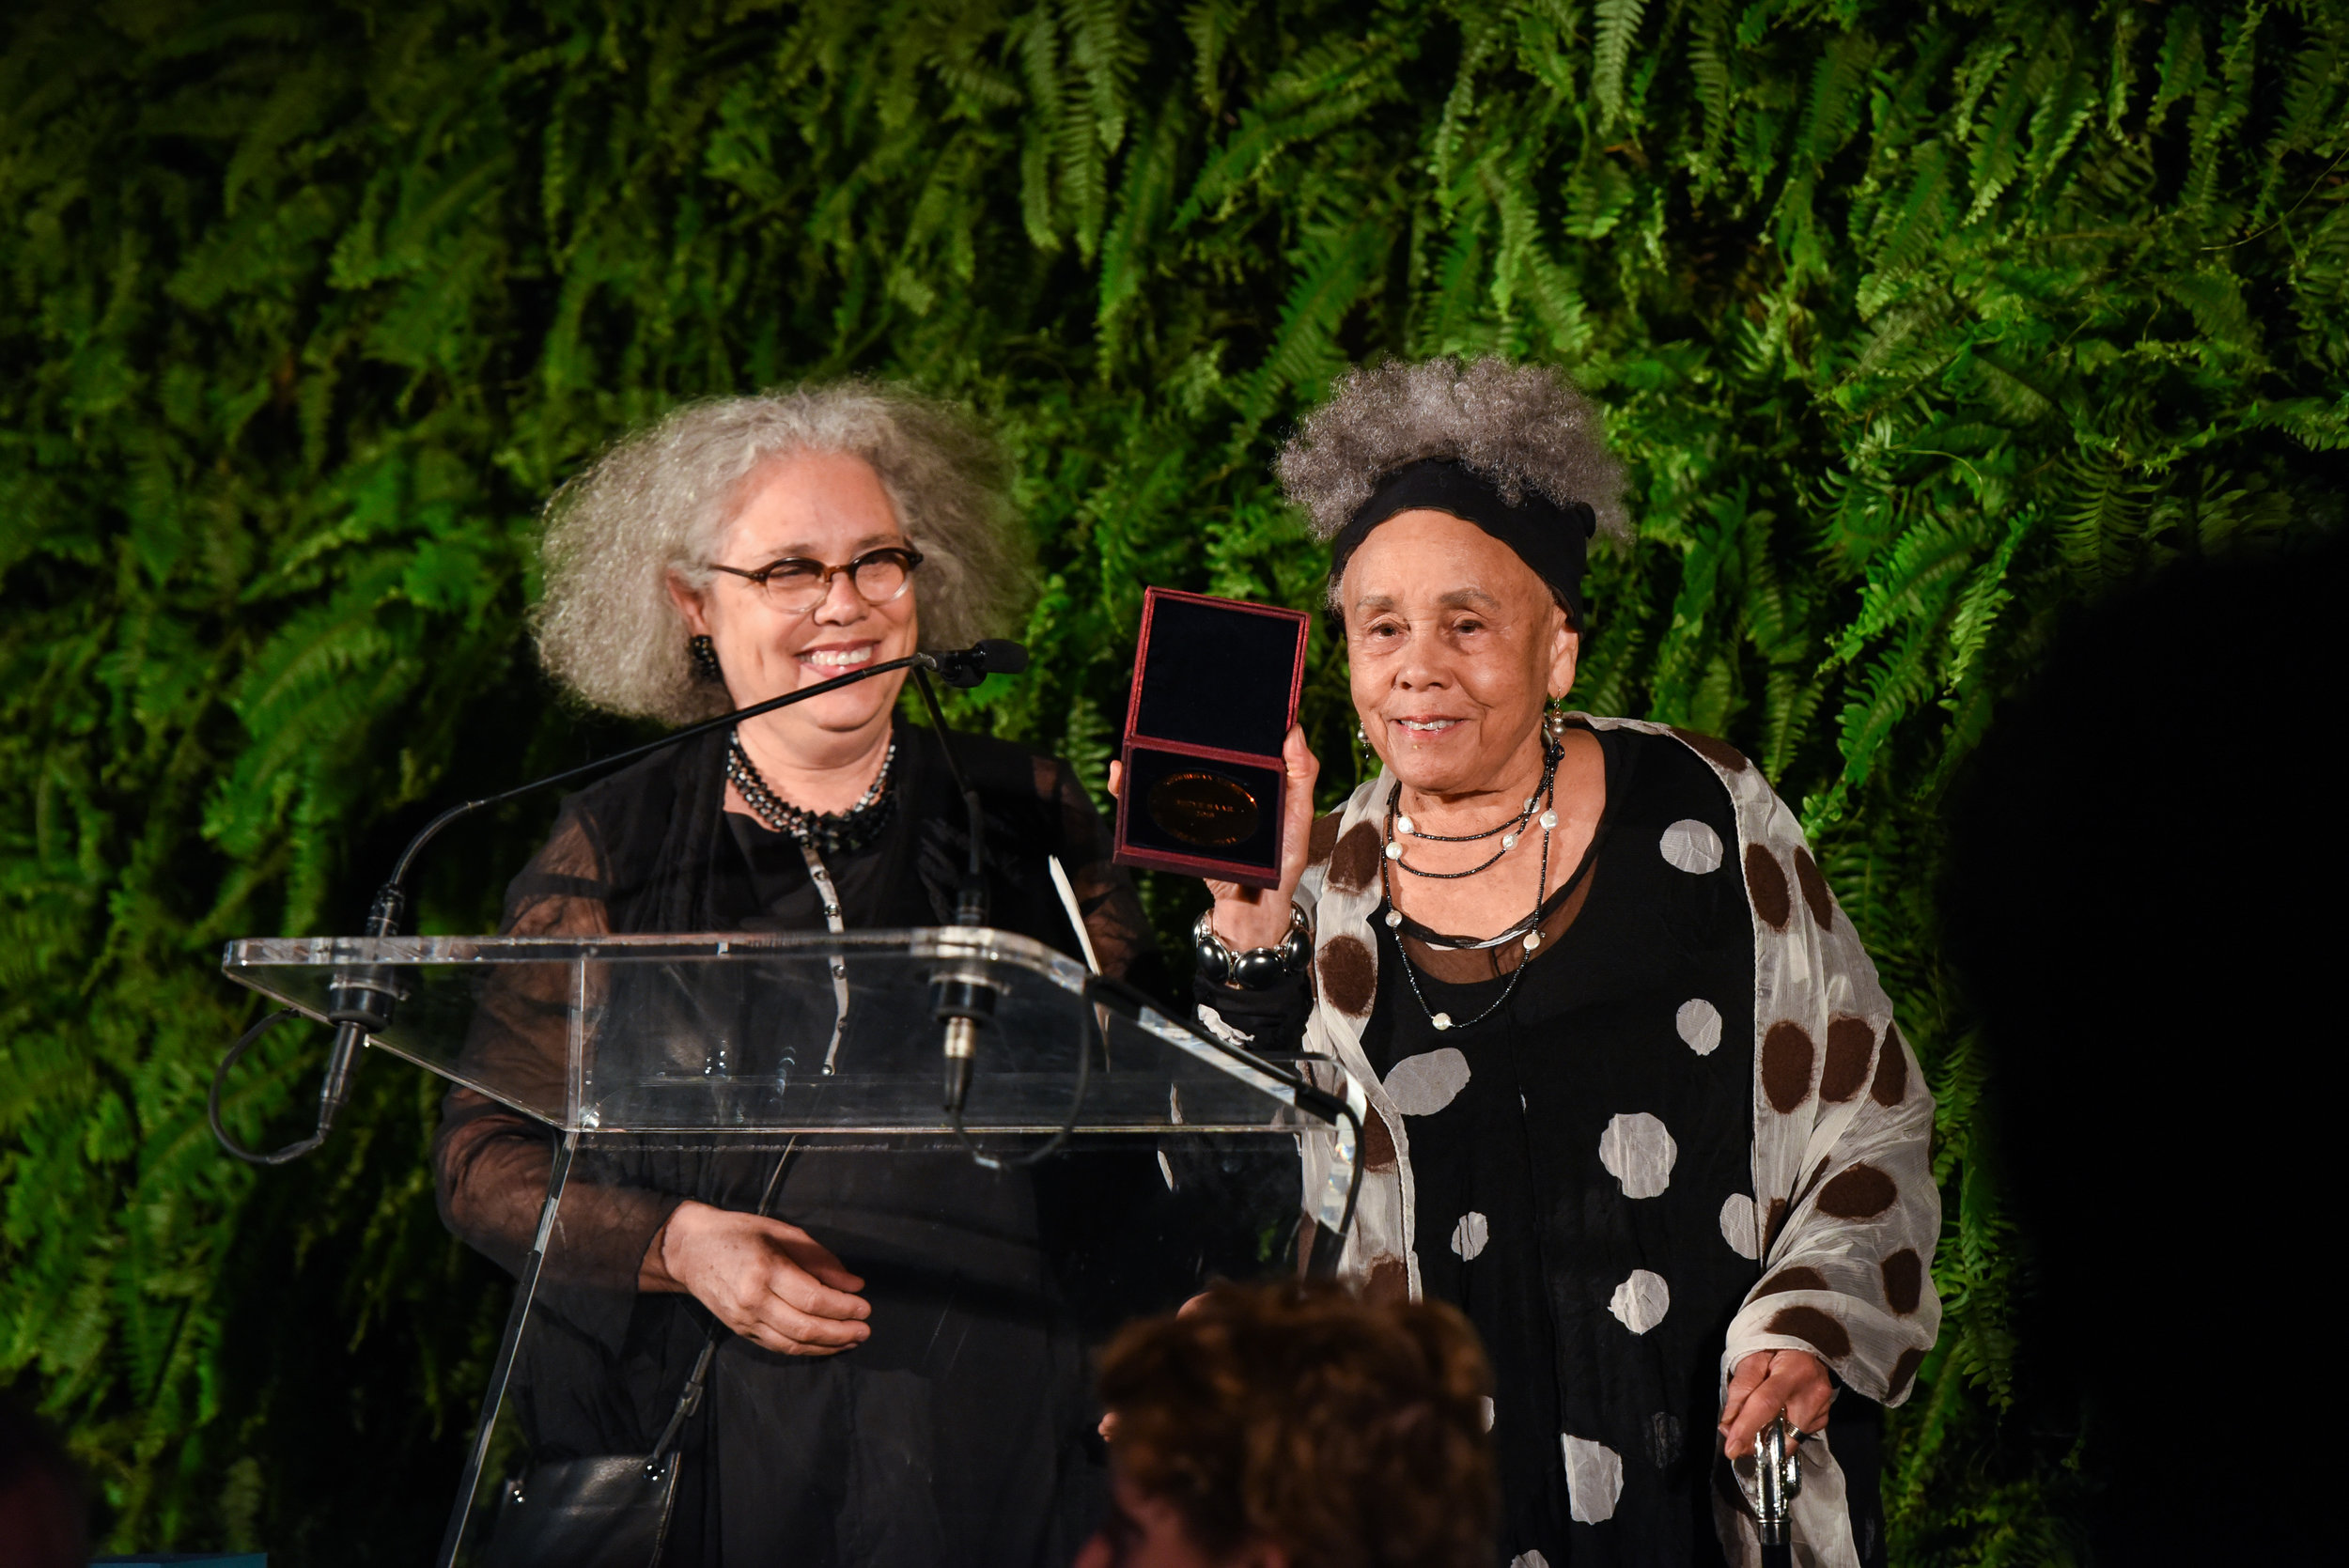 Alison Saar, Betye Saar==Skowhegan Awards Dinner 2018==The Plaza Hotel, New York, NY==April 24, 2018==�Patrick McMullan==Photo - Presley Ann/PMC====